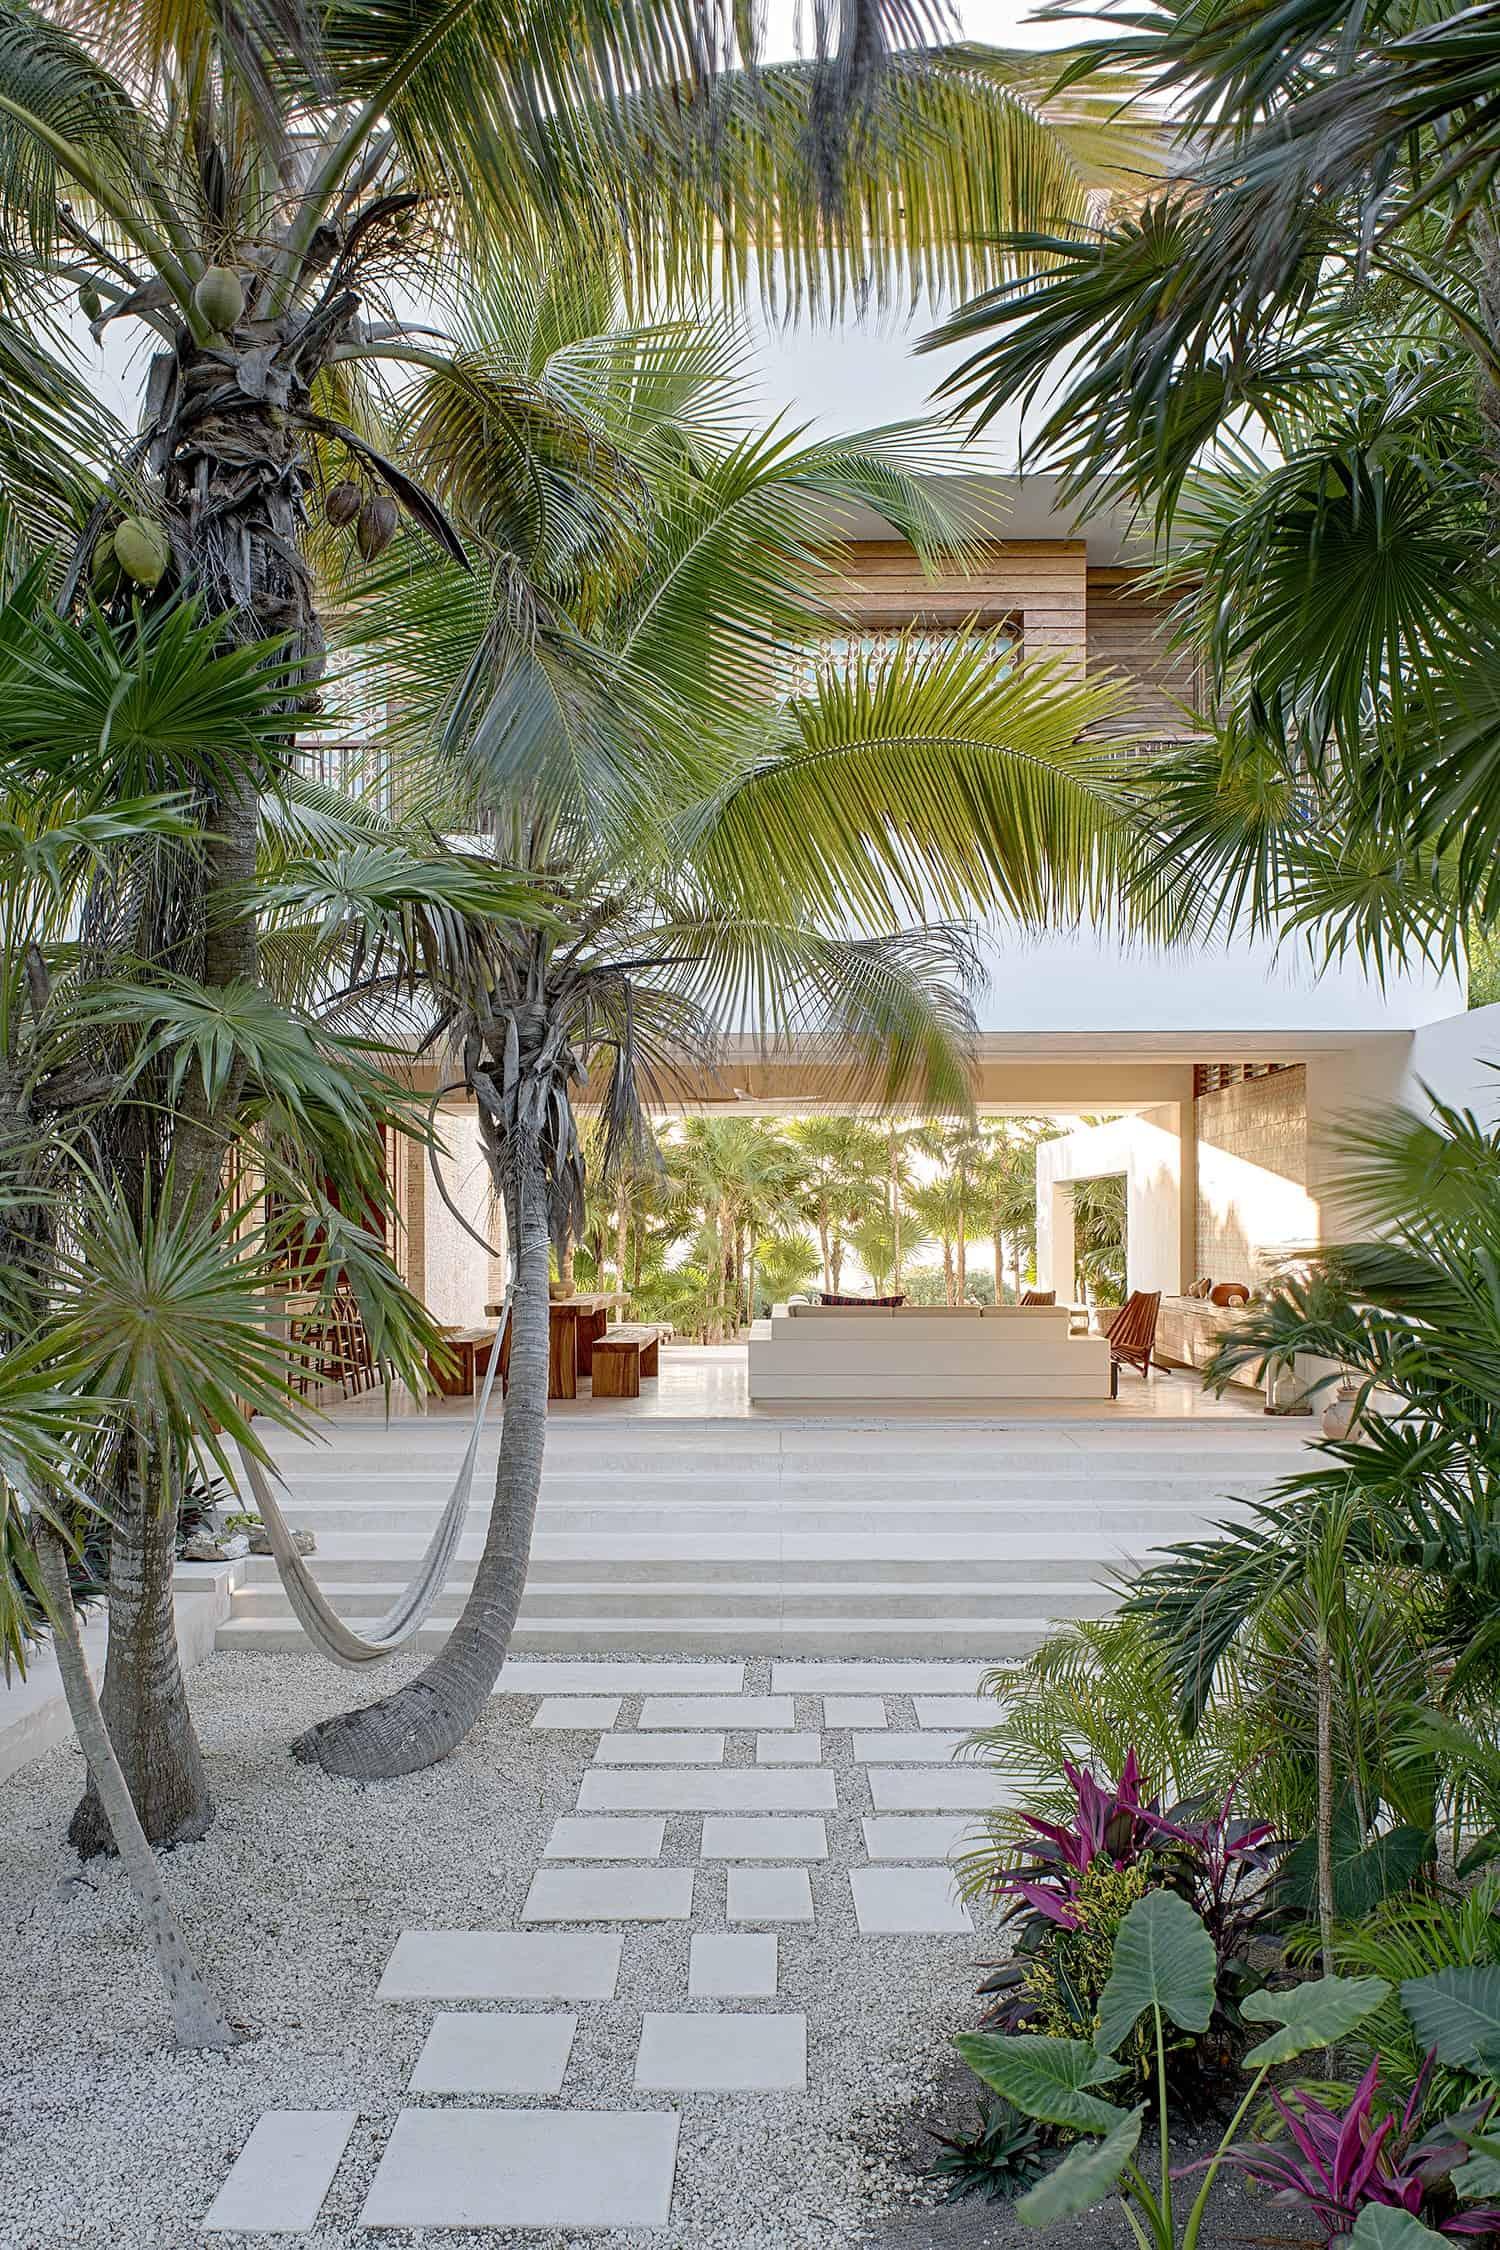 ecoluxe-private-villa-specht-harpman-27-1-kindesign